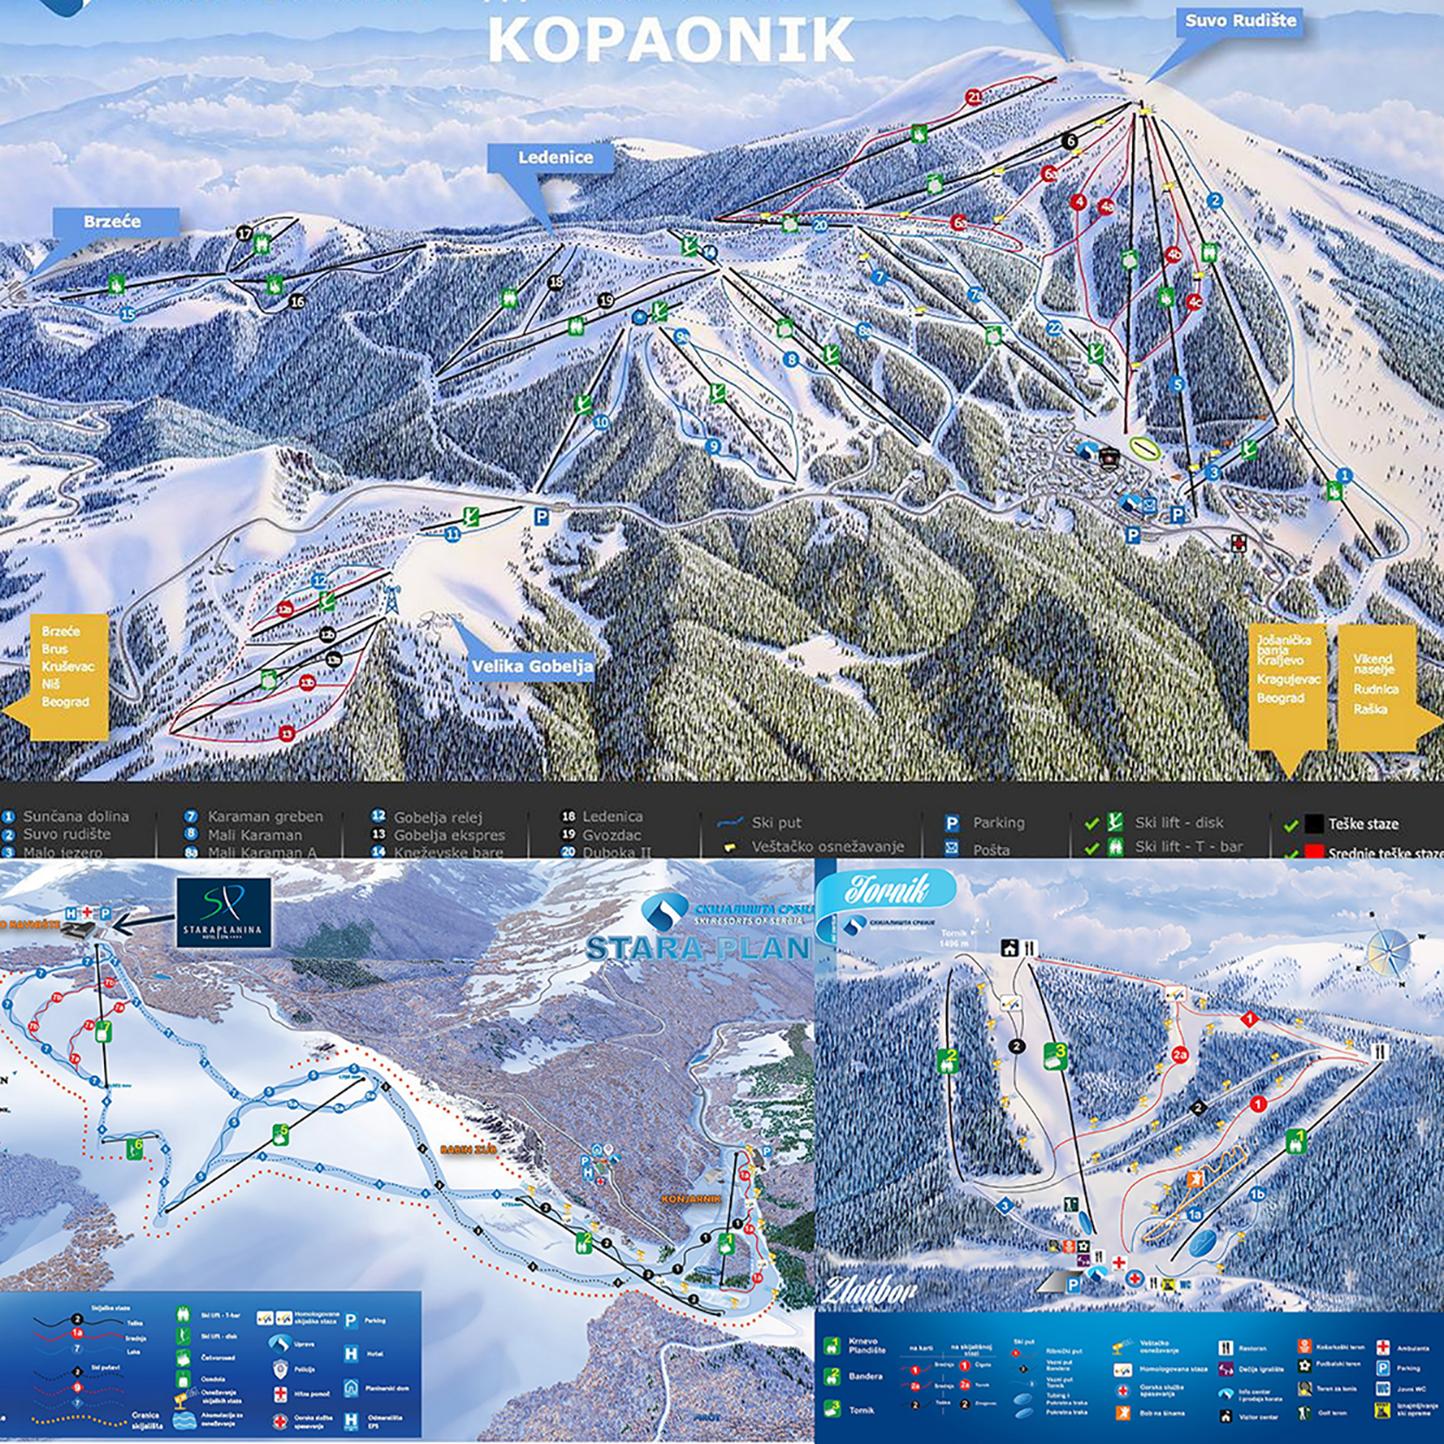 Mape ski centara Kopaonik, Stara planina i Tornik